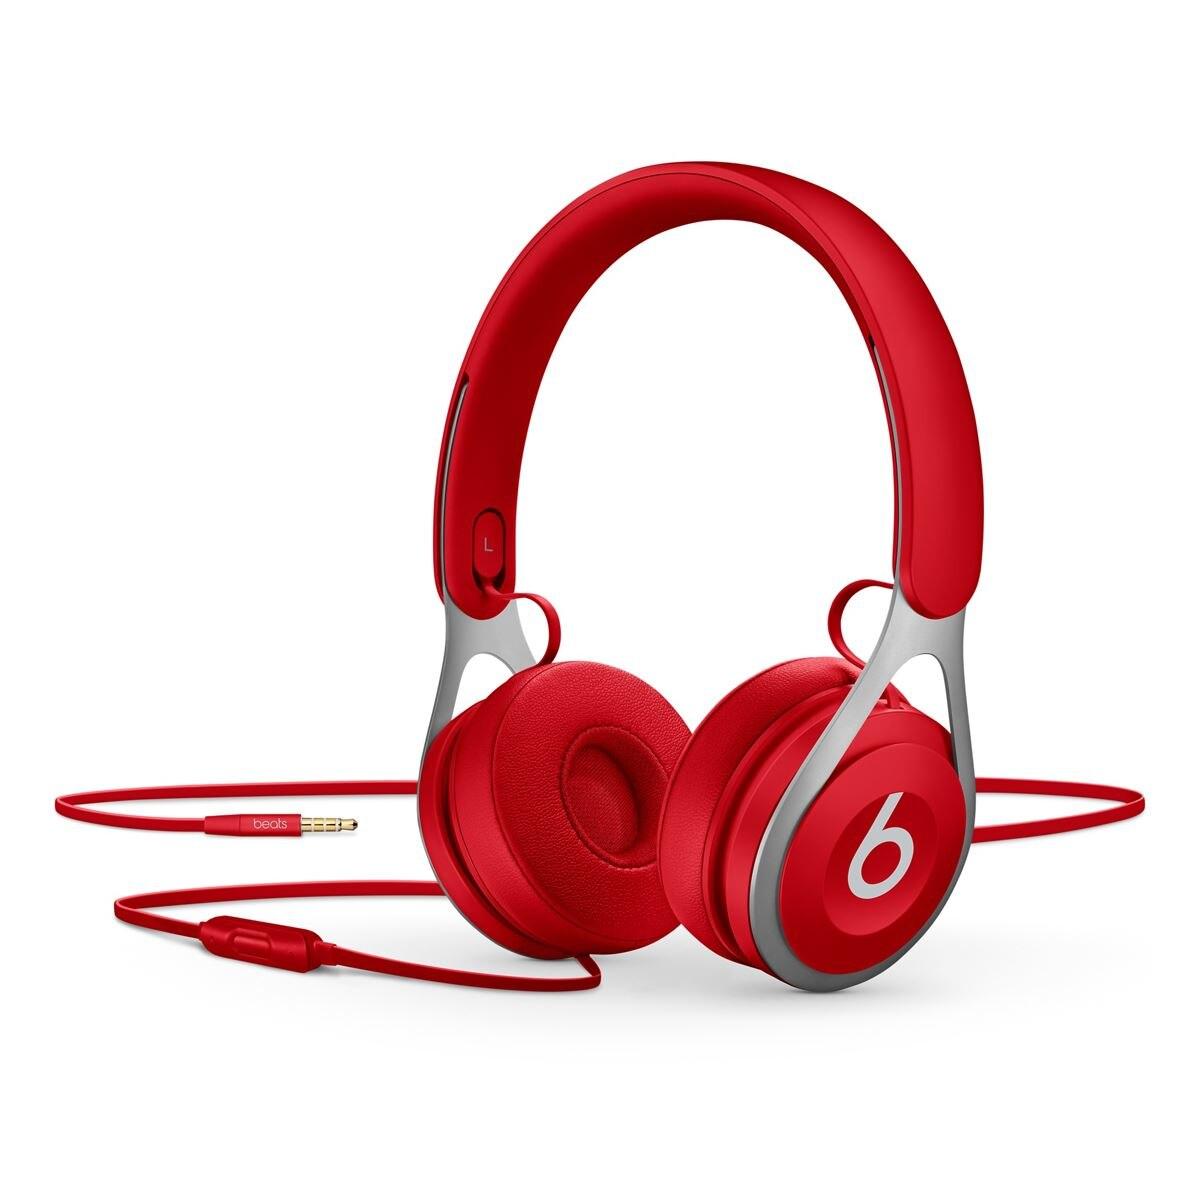 Audifonos Beats Ep Ml9C2Be/A Rojo 1 U